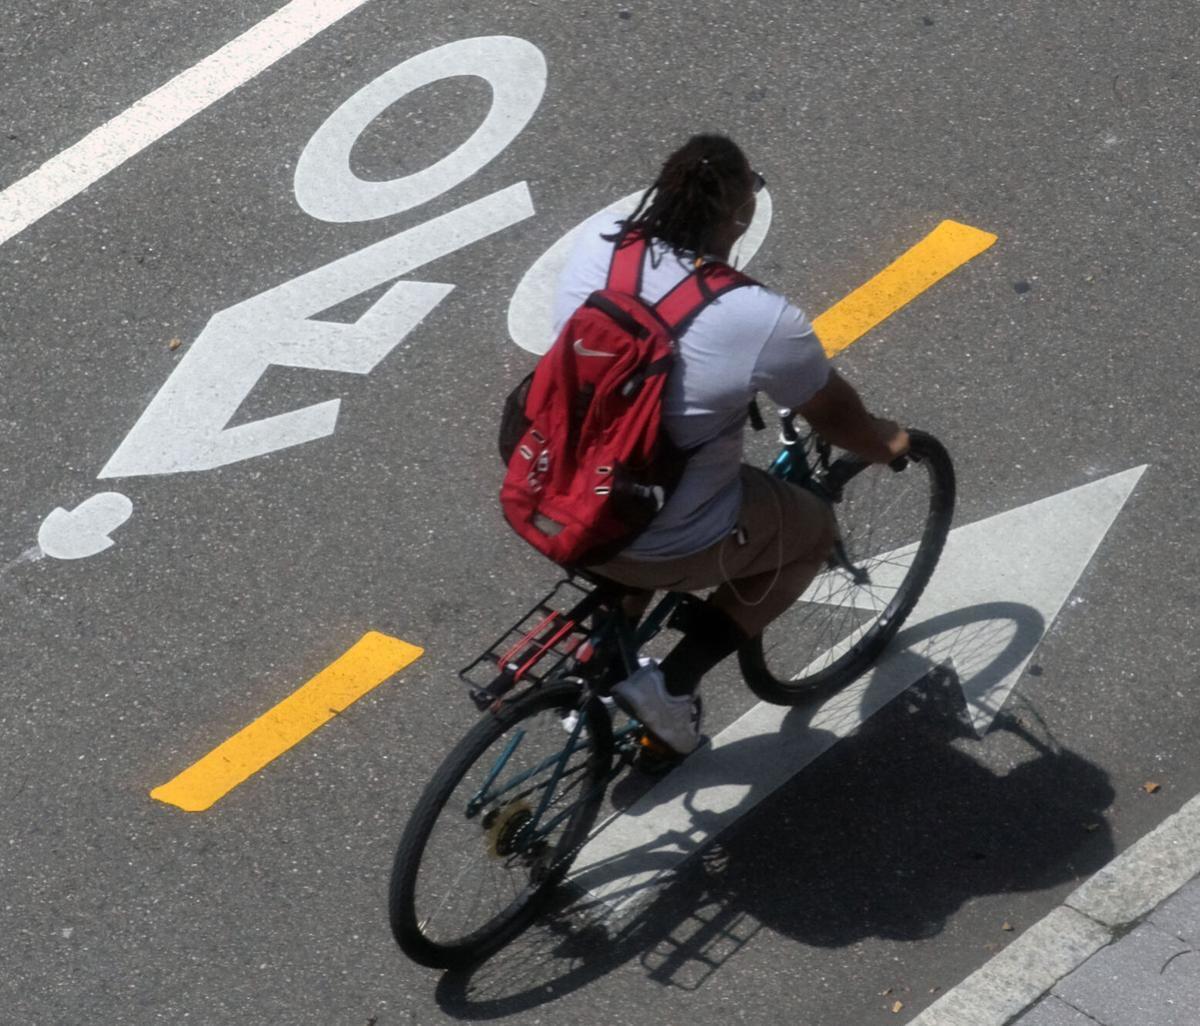 PHOTO: Cyclist